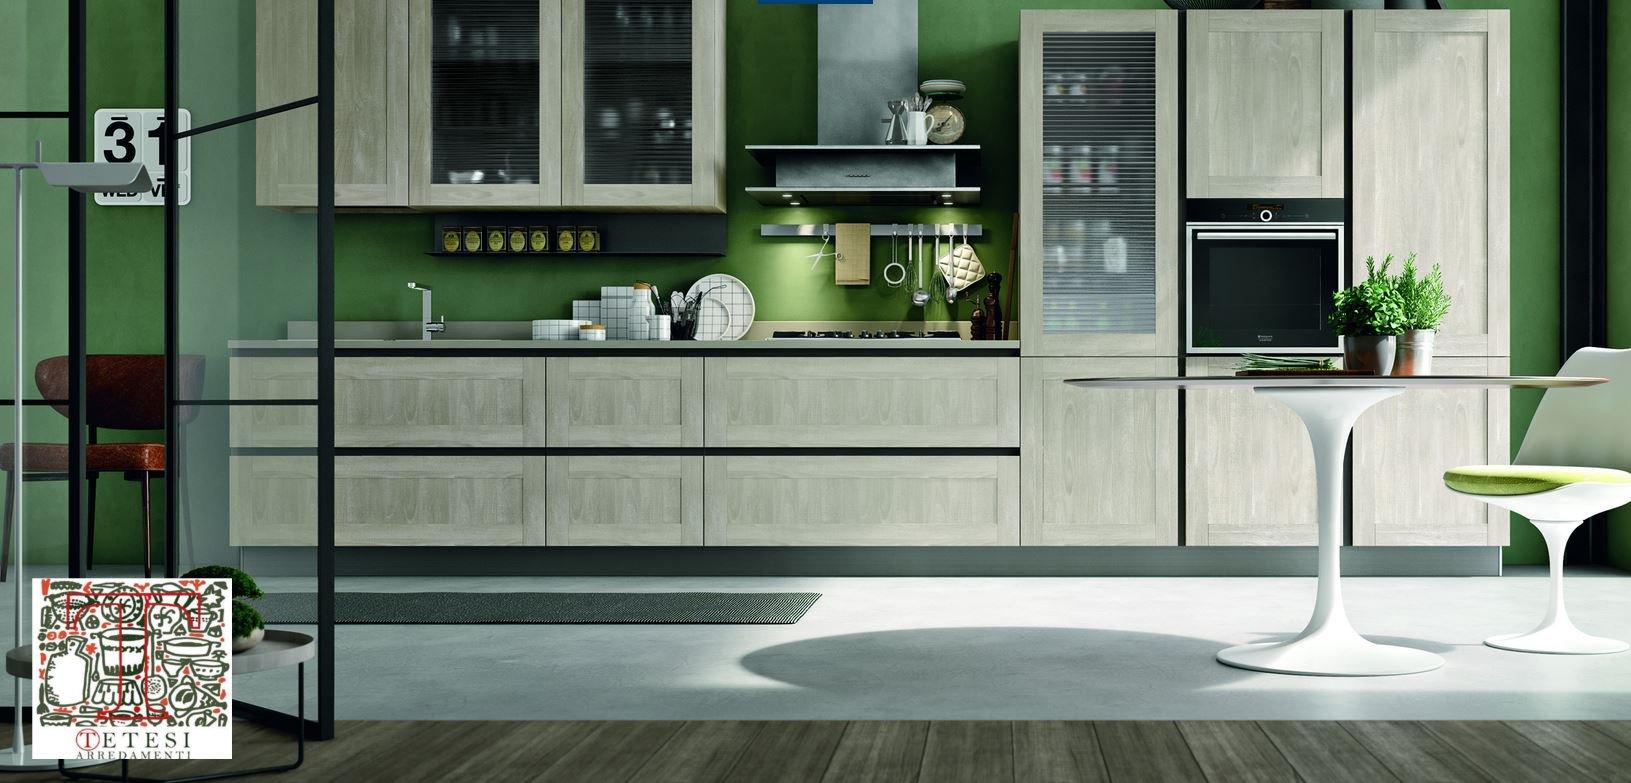 INDUSTRIAL CHIC #865045 1631 783 Cucine Stile Industrial Chic